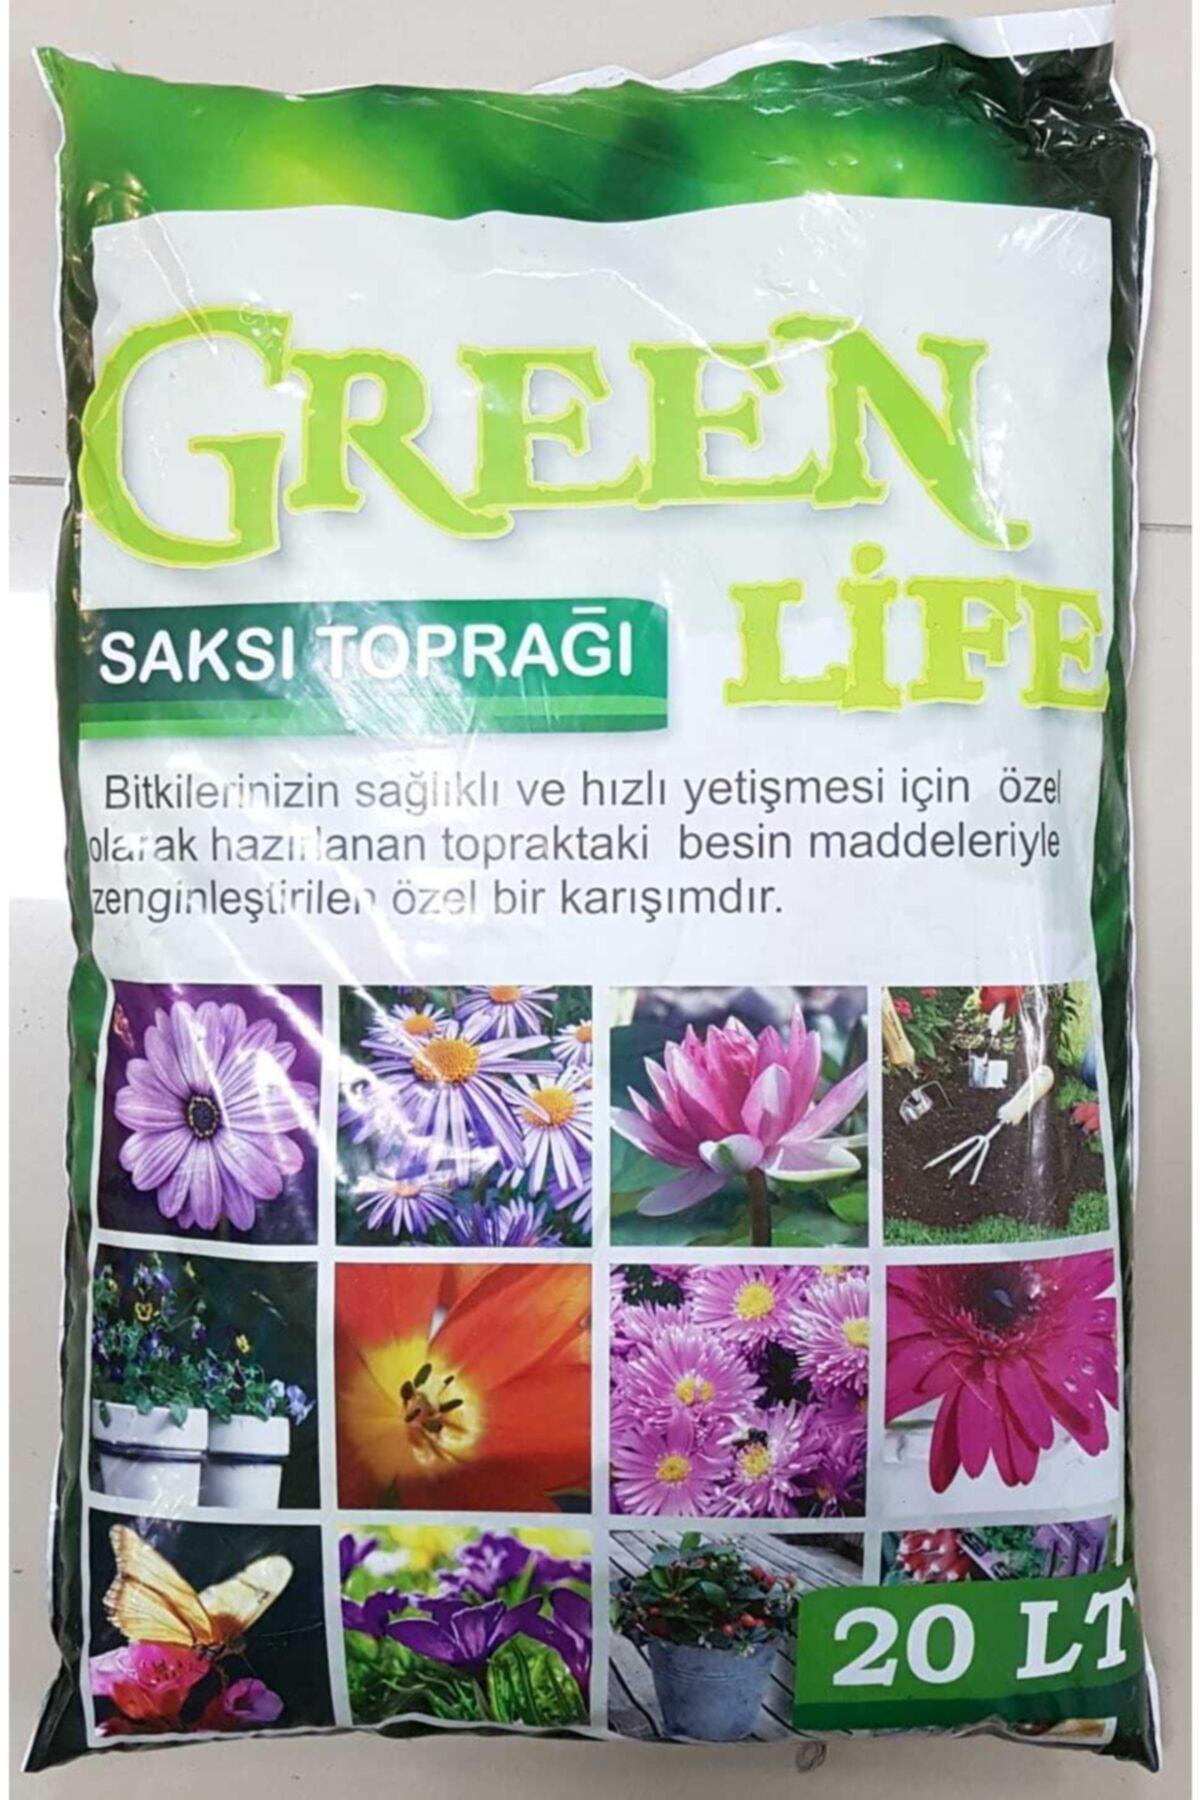 Green Life Humus Katkılı Harika Bitki Toprağı Çiçek Toprağı Torf 20 lt 1